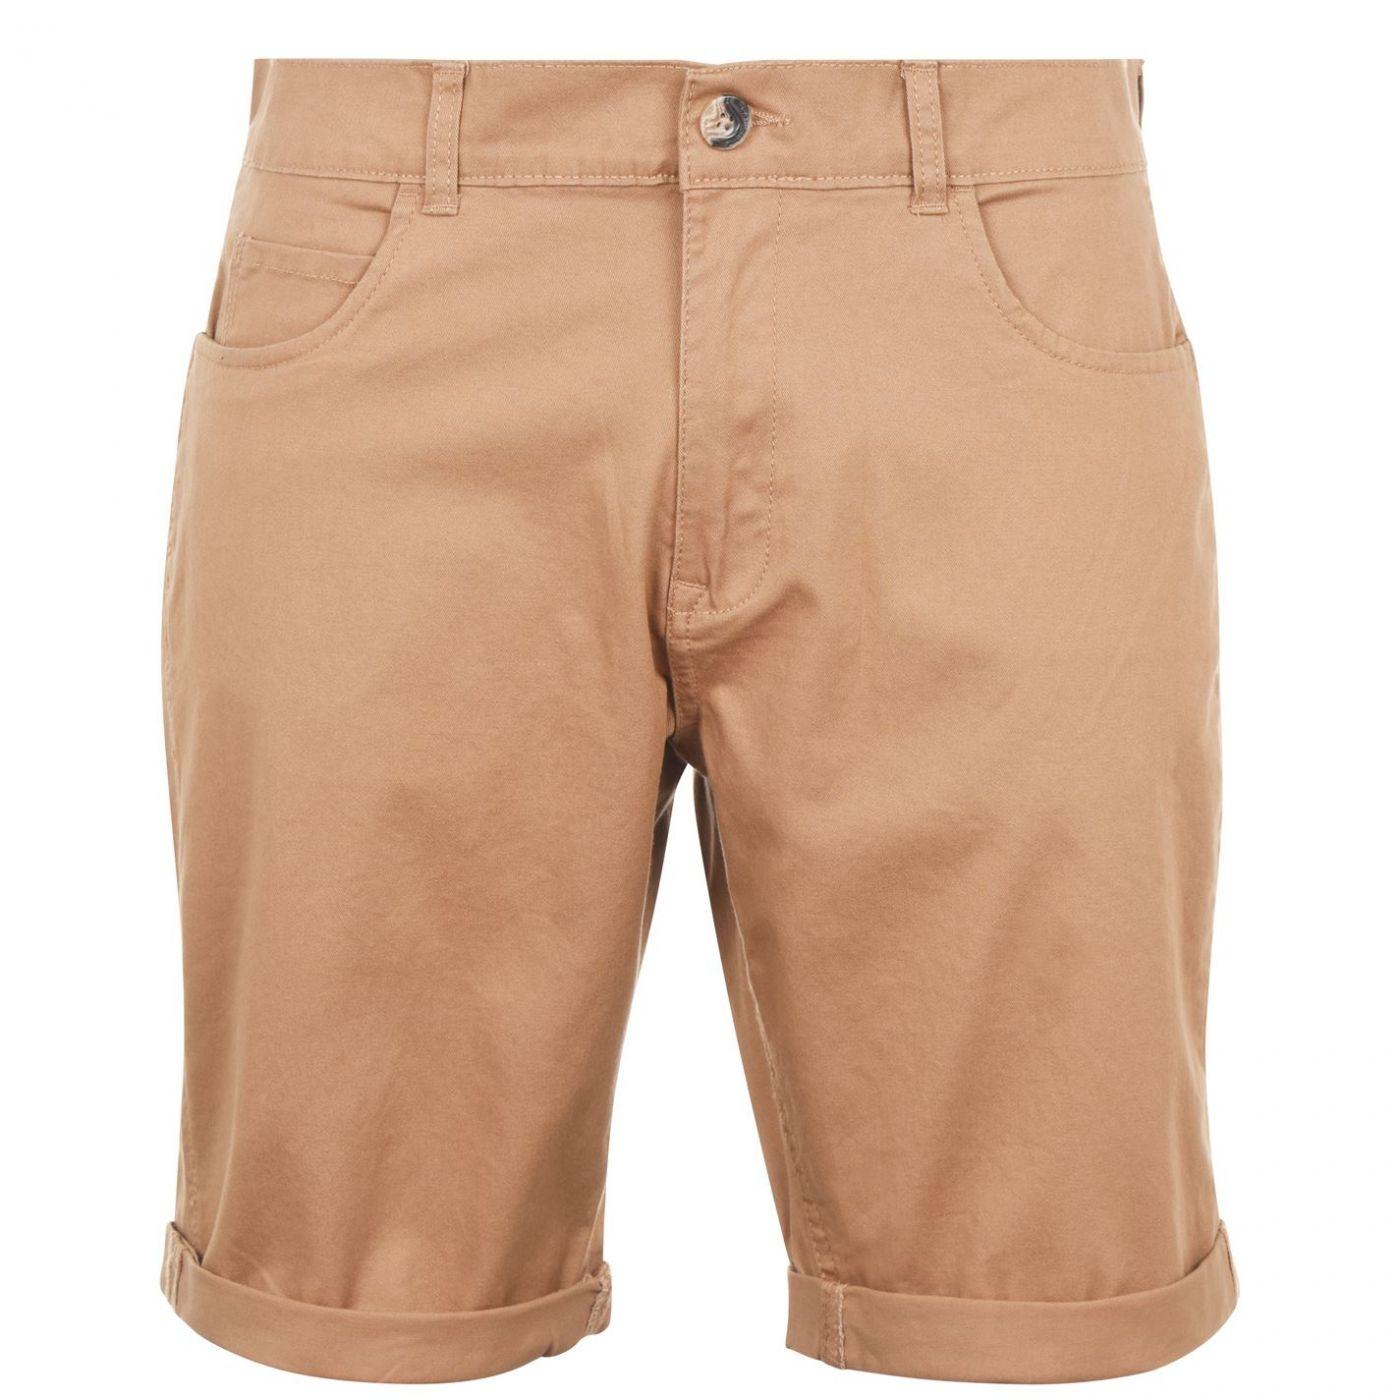 Lambretta Chino Shorts Mens